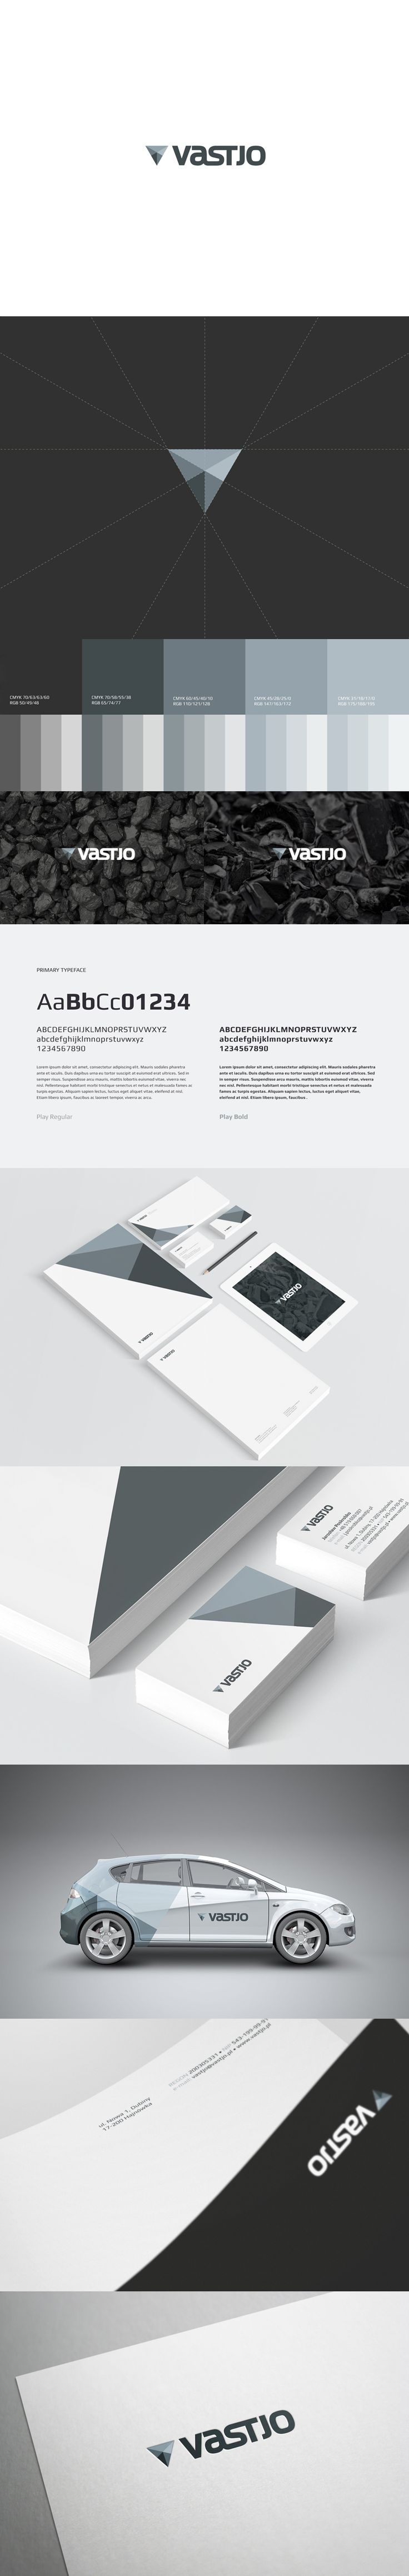 Vastjo: Company Identity and Branding Spread | #design #identity #branding #logo #business #marketing #advertising